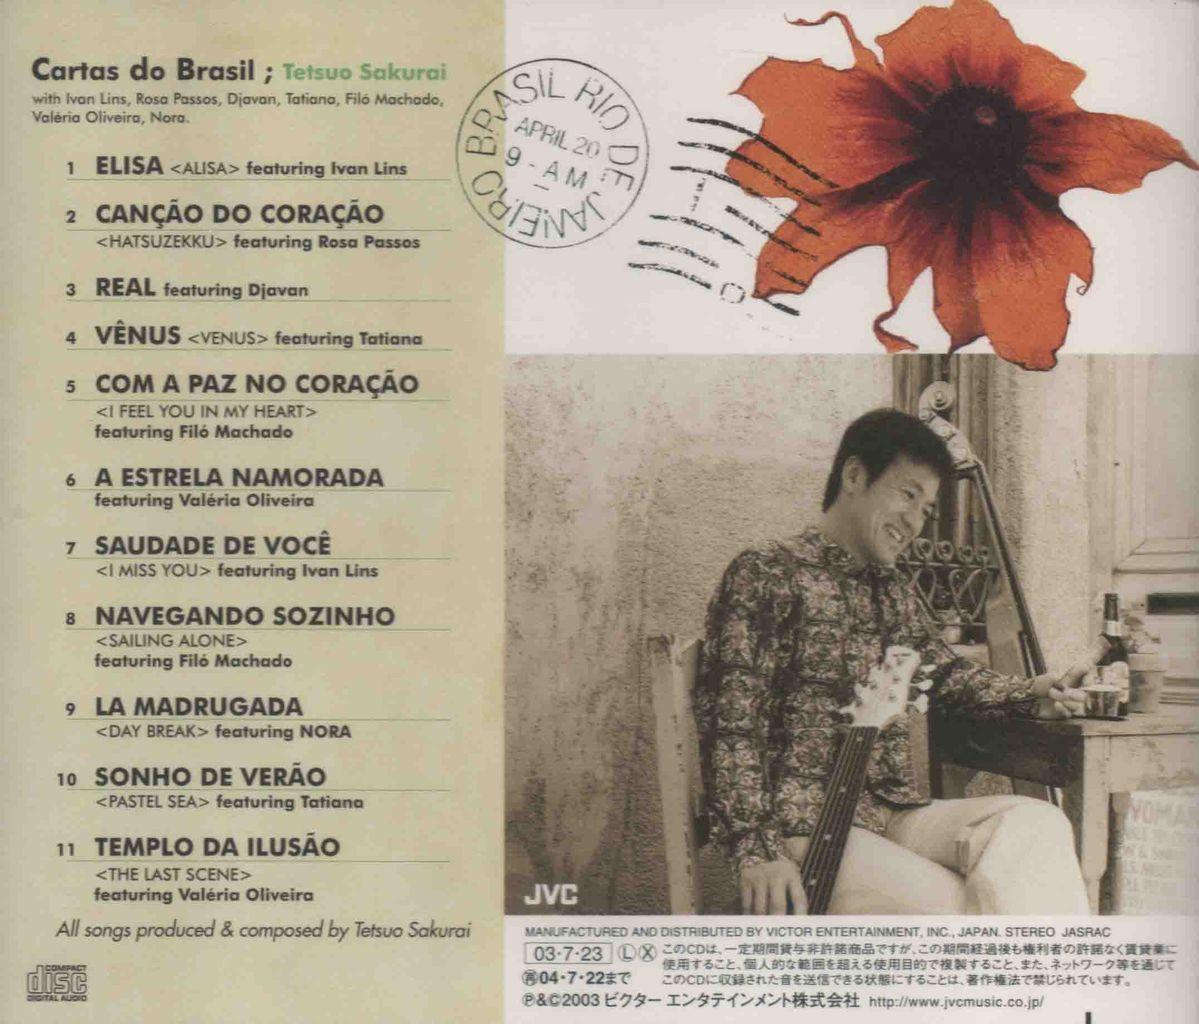 CARTAS DO BRASIL-2